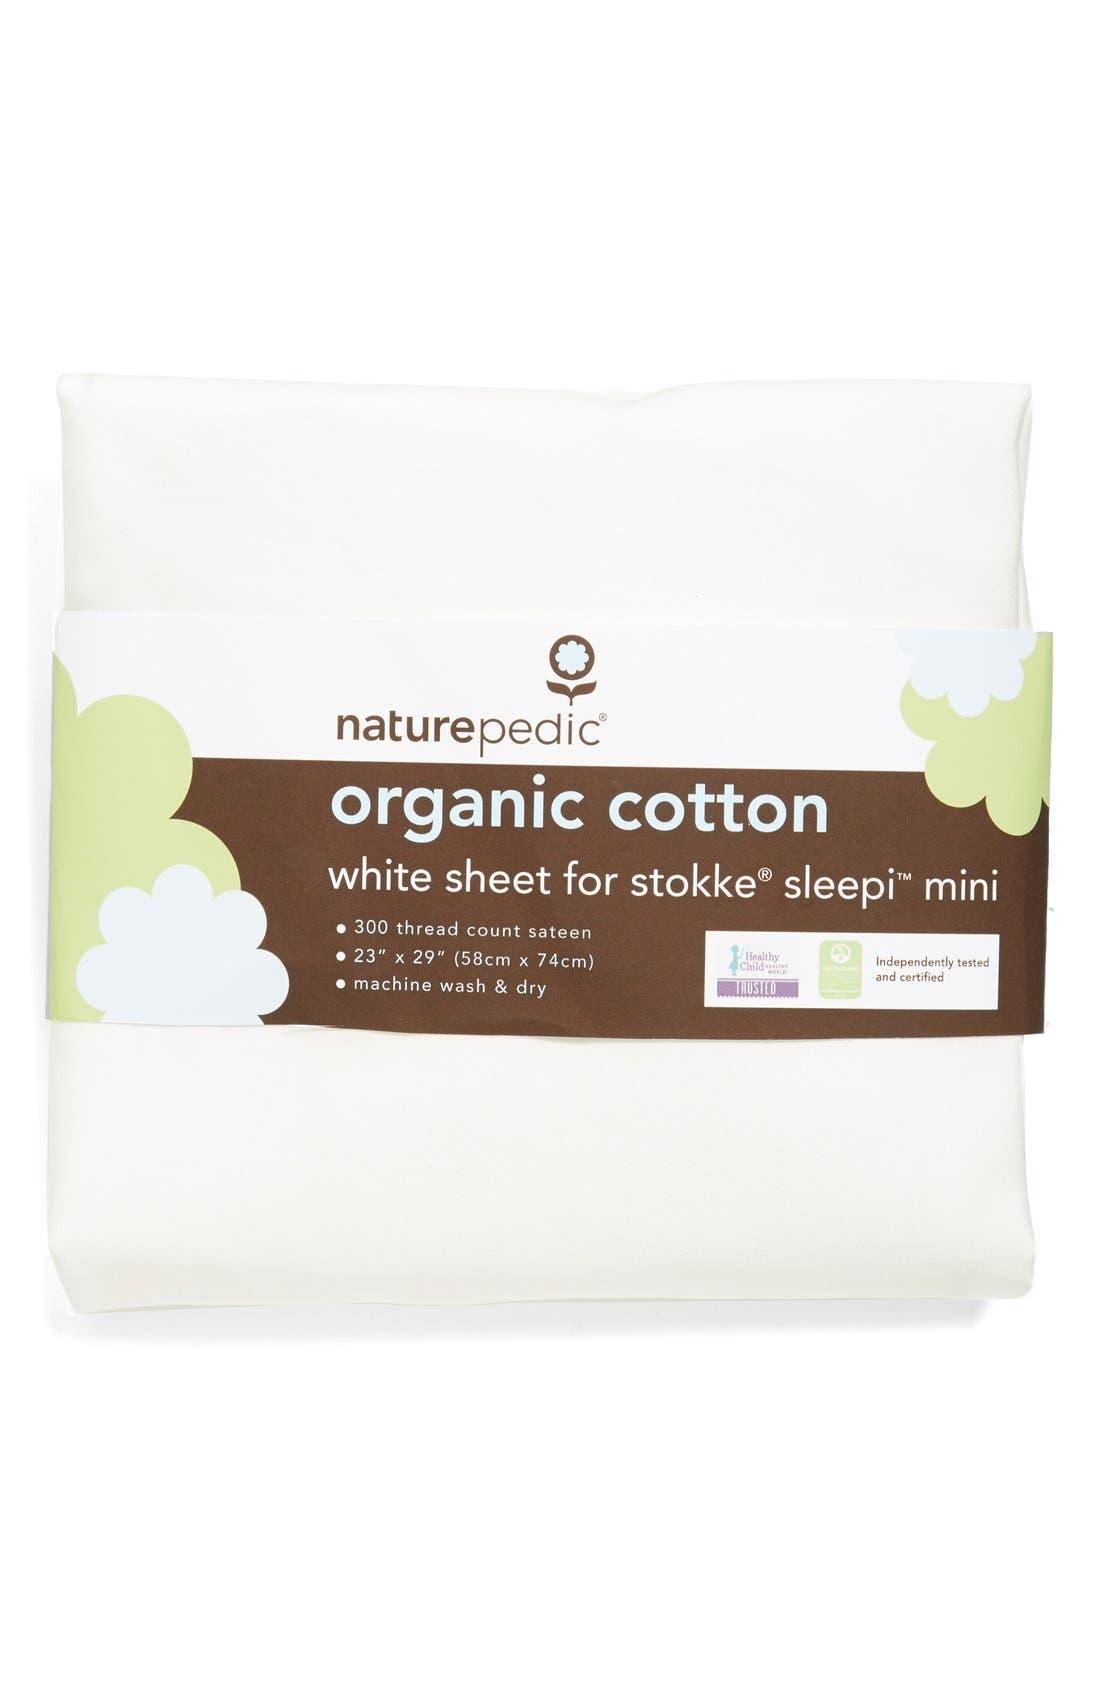 300 Thread Count Organic Cotton Oval Crib Sheet for Stokke Sleepi Mini,                         Main,                         color, White